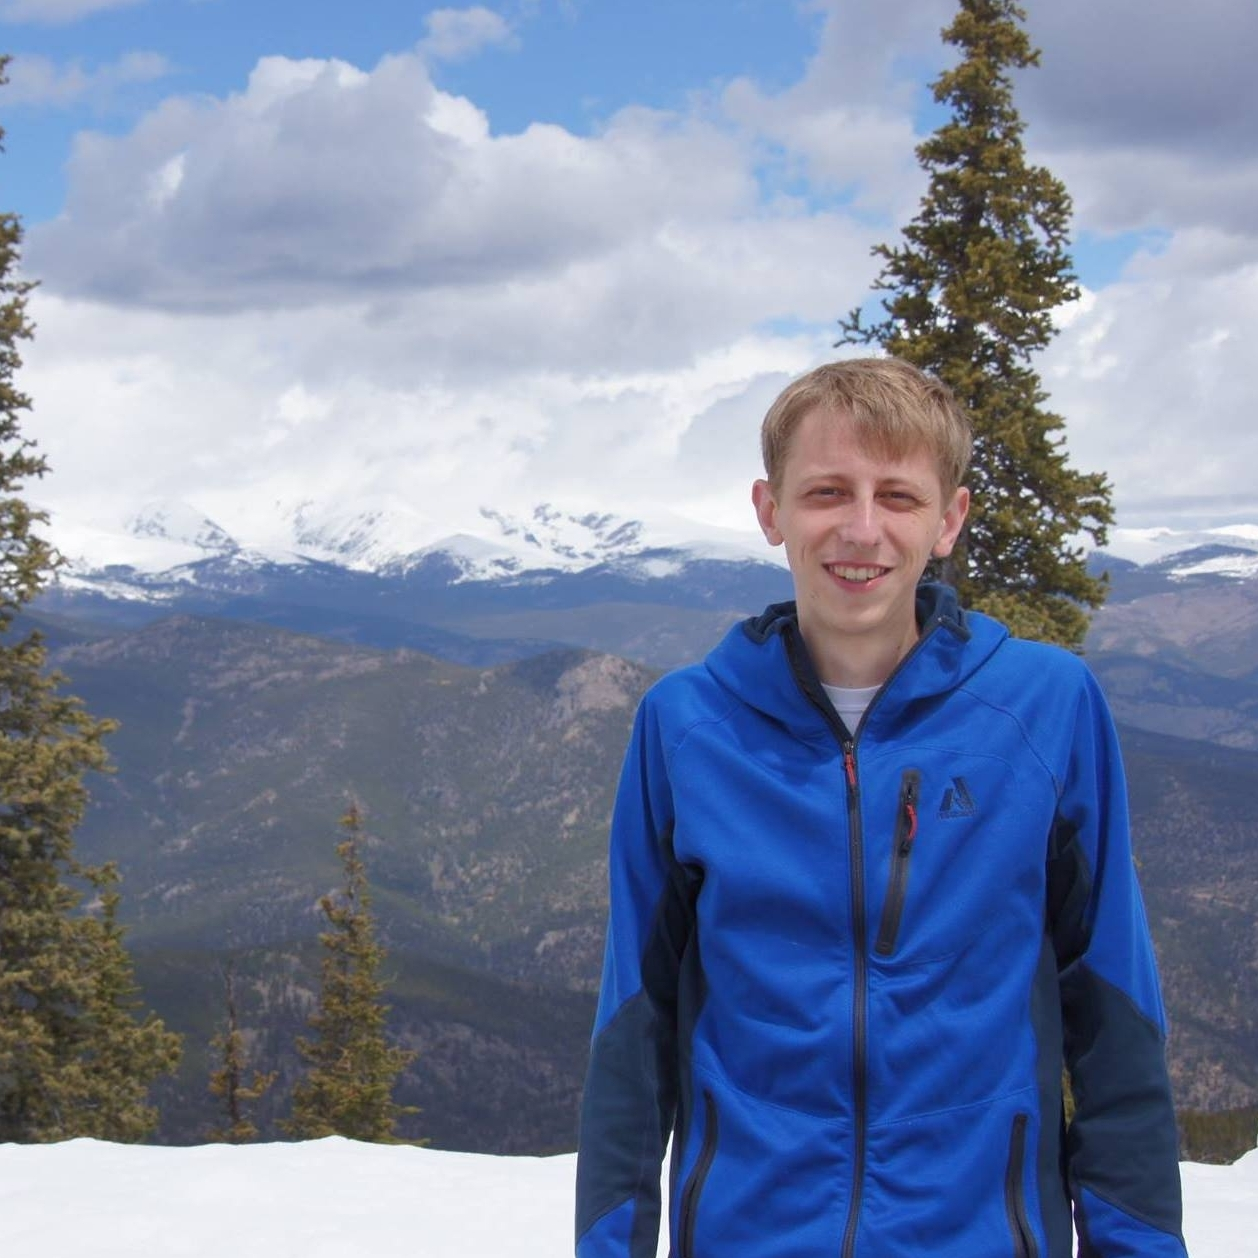 Nathan Stein, Founder - Washington University Class of 2015